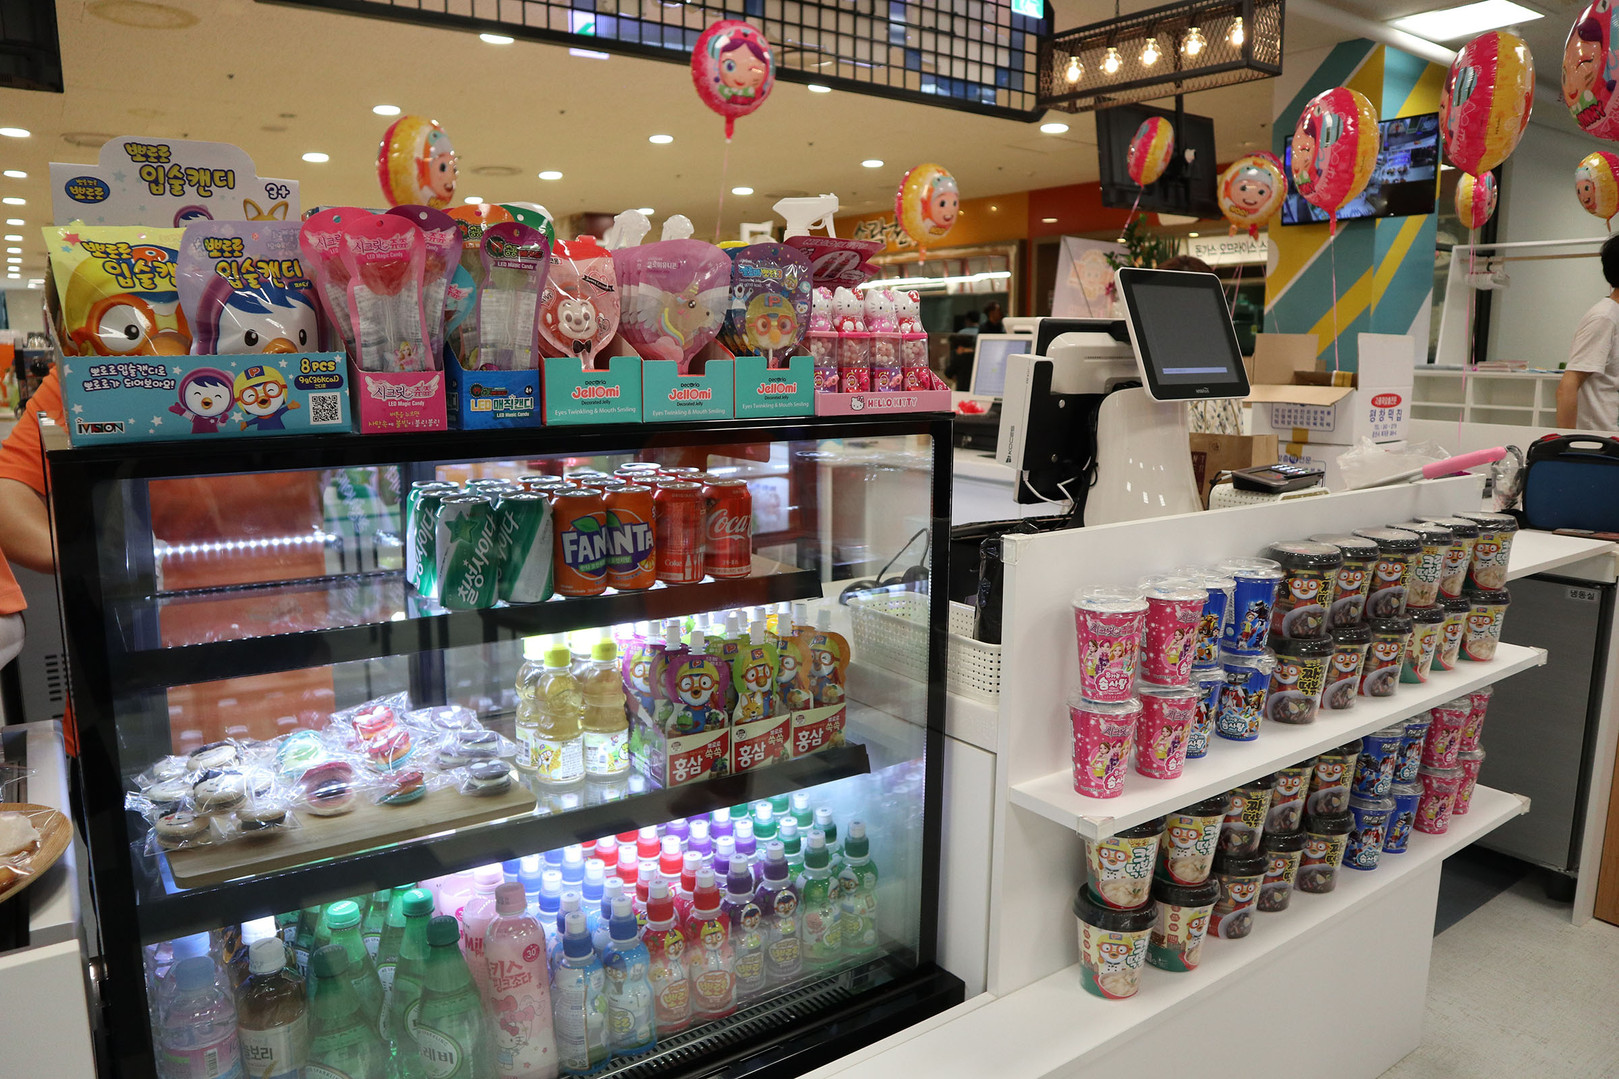 Nori Digital Kids Cafe, Lotte Mart, Chuncheon Onui Branch